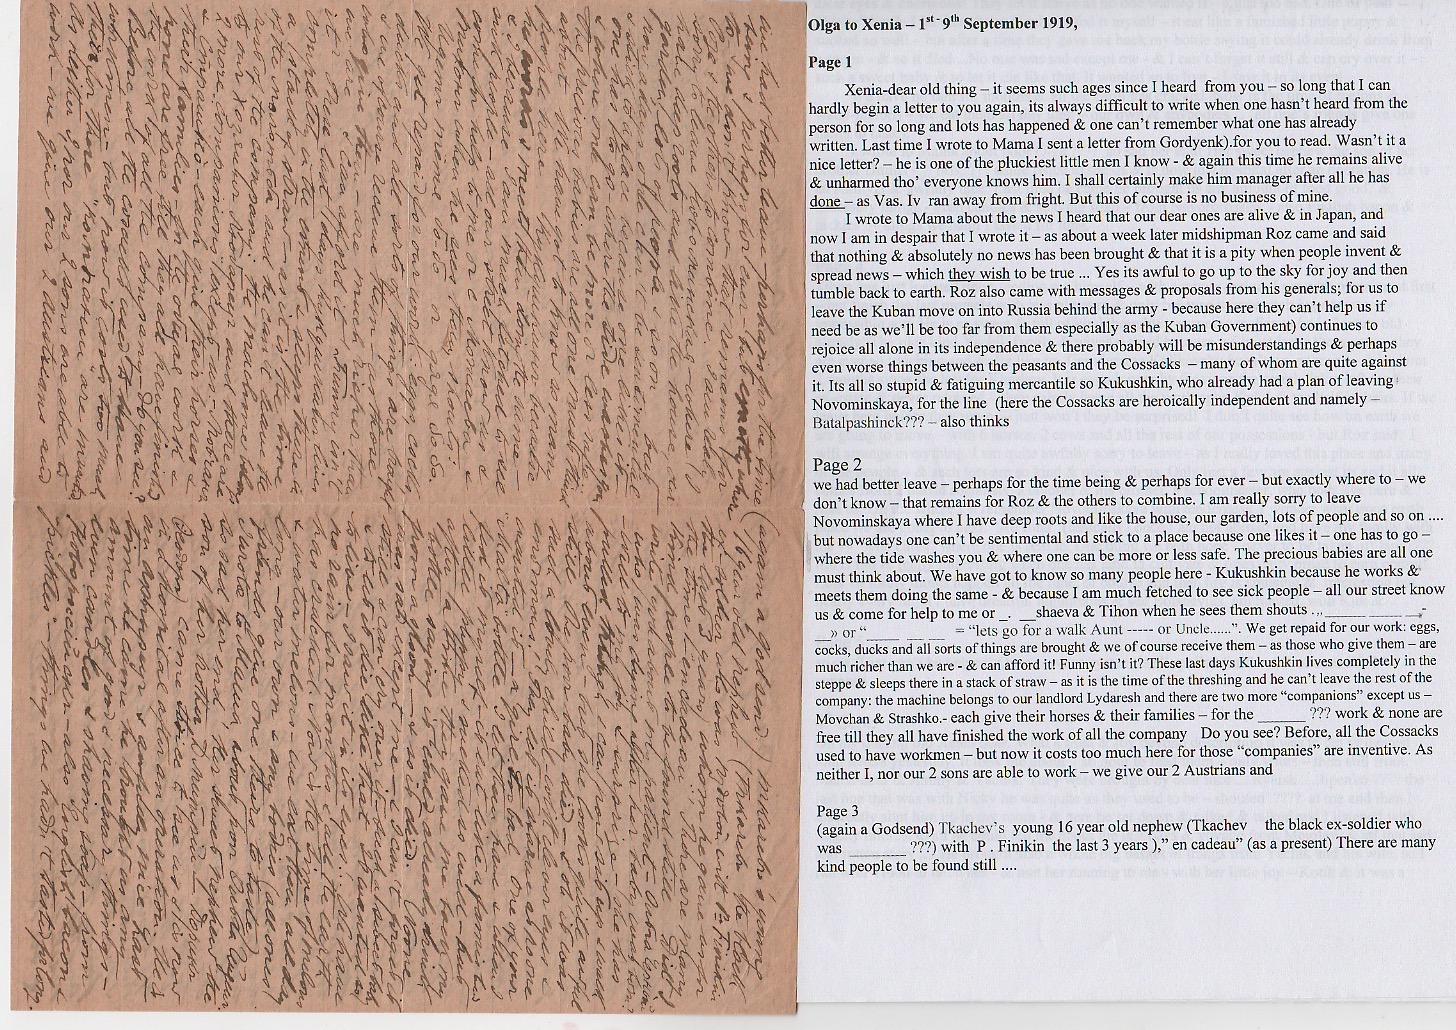 Royalty Grand Duchess Olga Correspondence To Her Sister Grand Duchess Xenia 1916-1920 - Image 9 of 47